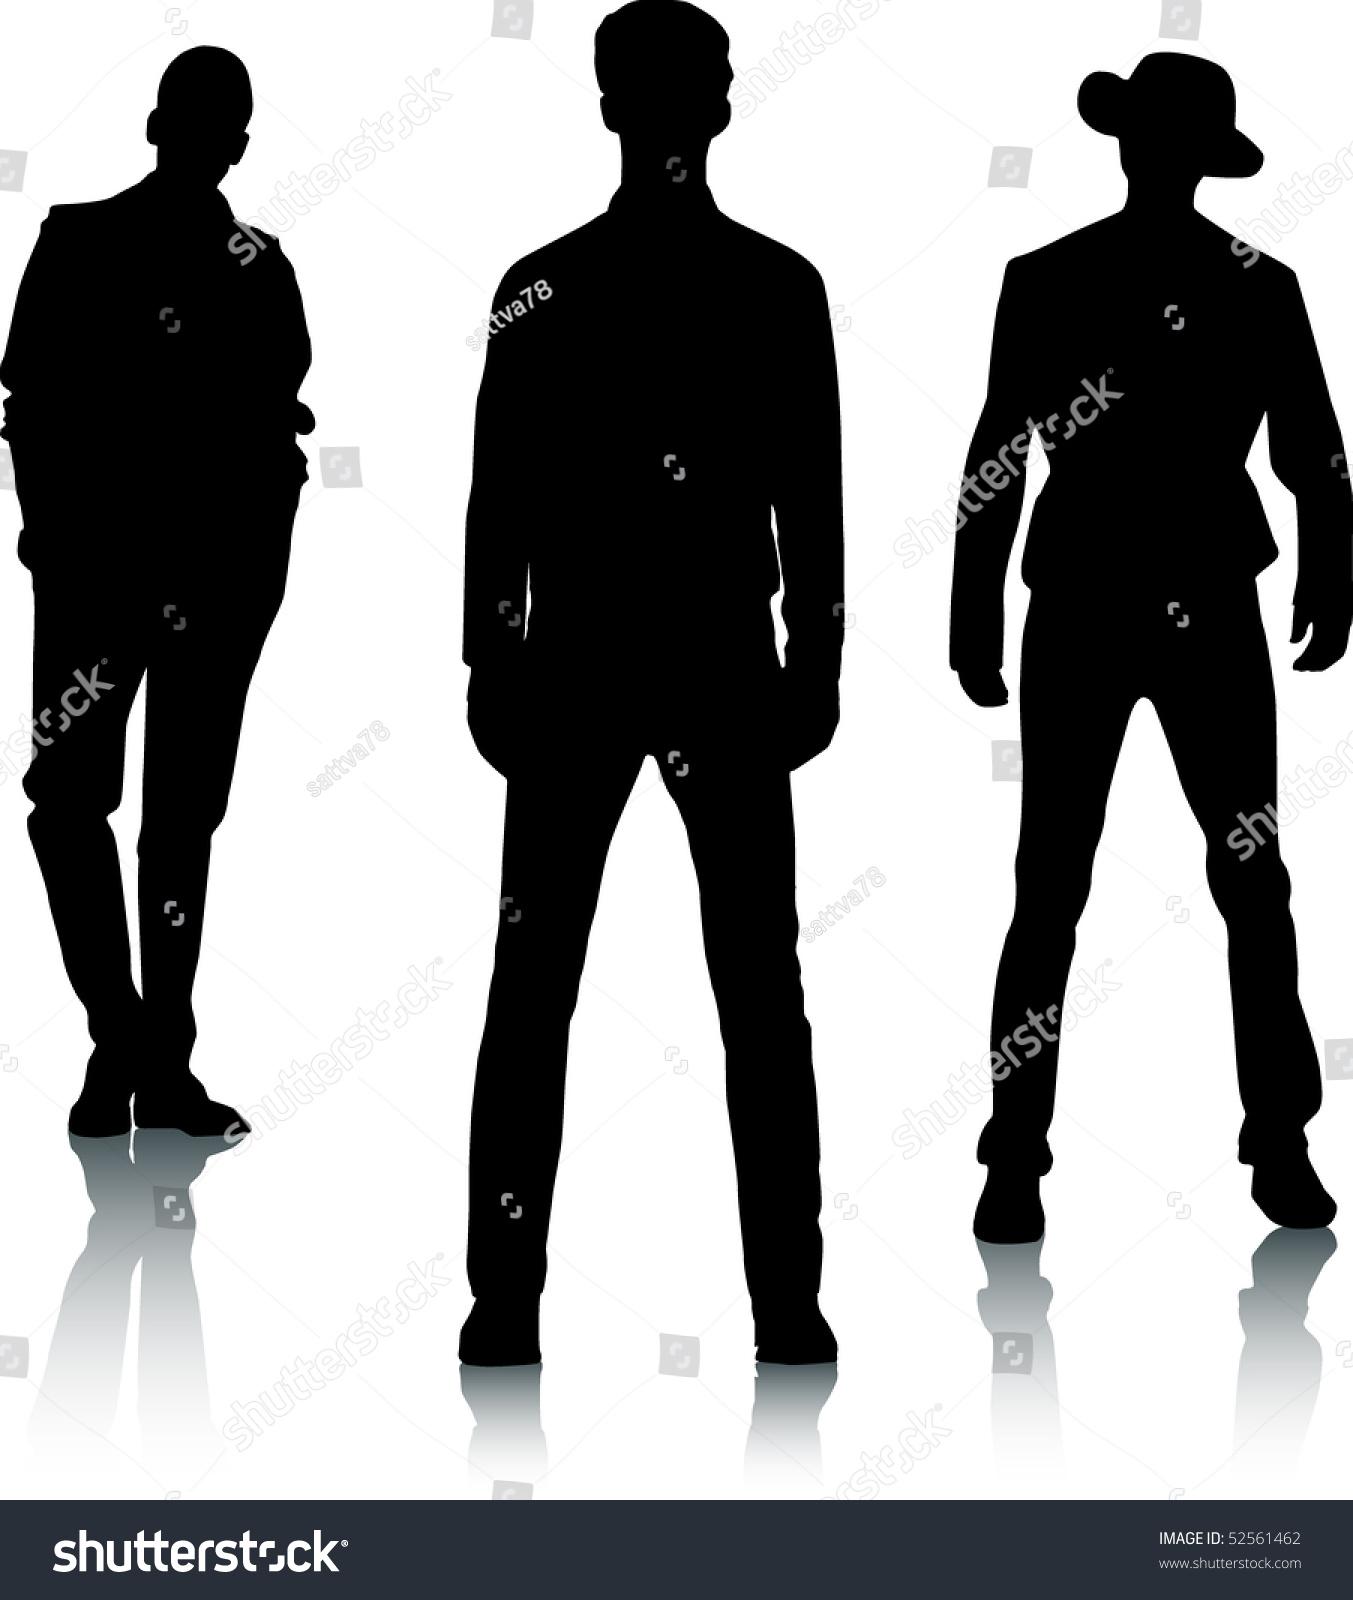 da9630bd308 Silhouette fashion men stock vector royalty free jpg 1353x1600 Man  silhouette fashion